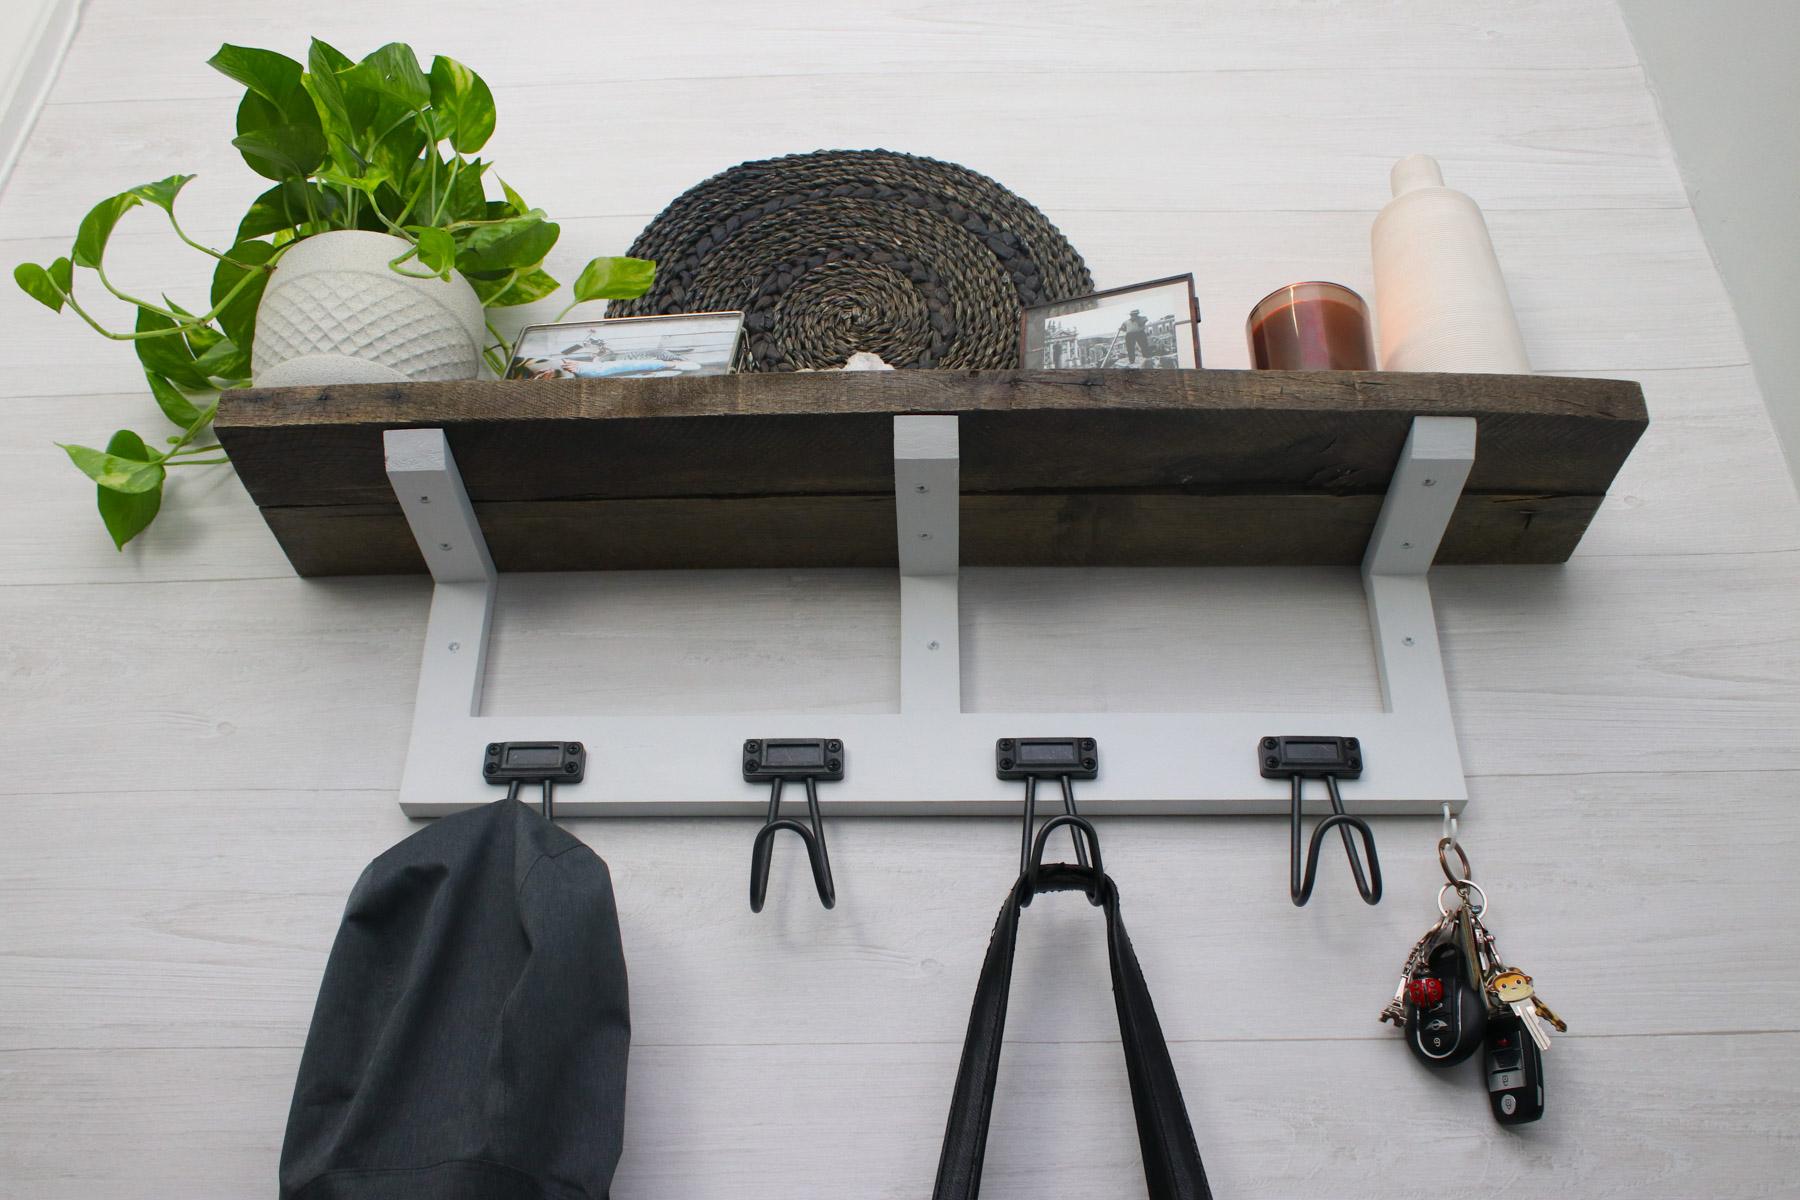 diy rustic mantel or shelf (simple pallet funiture)